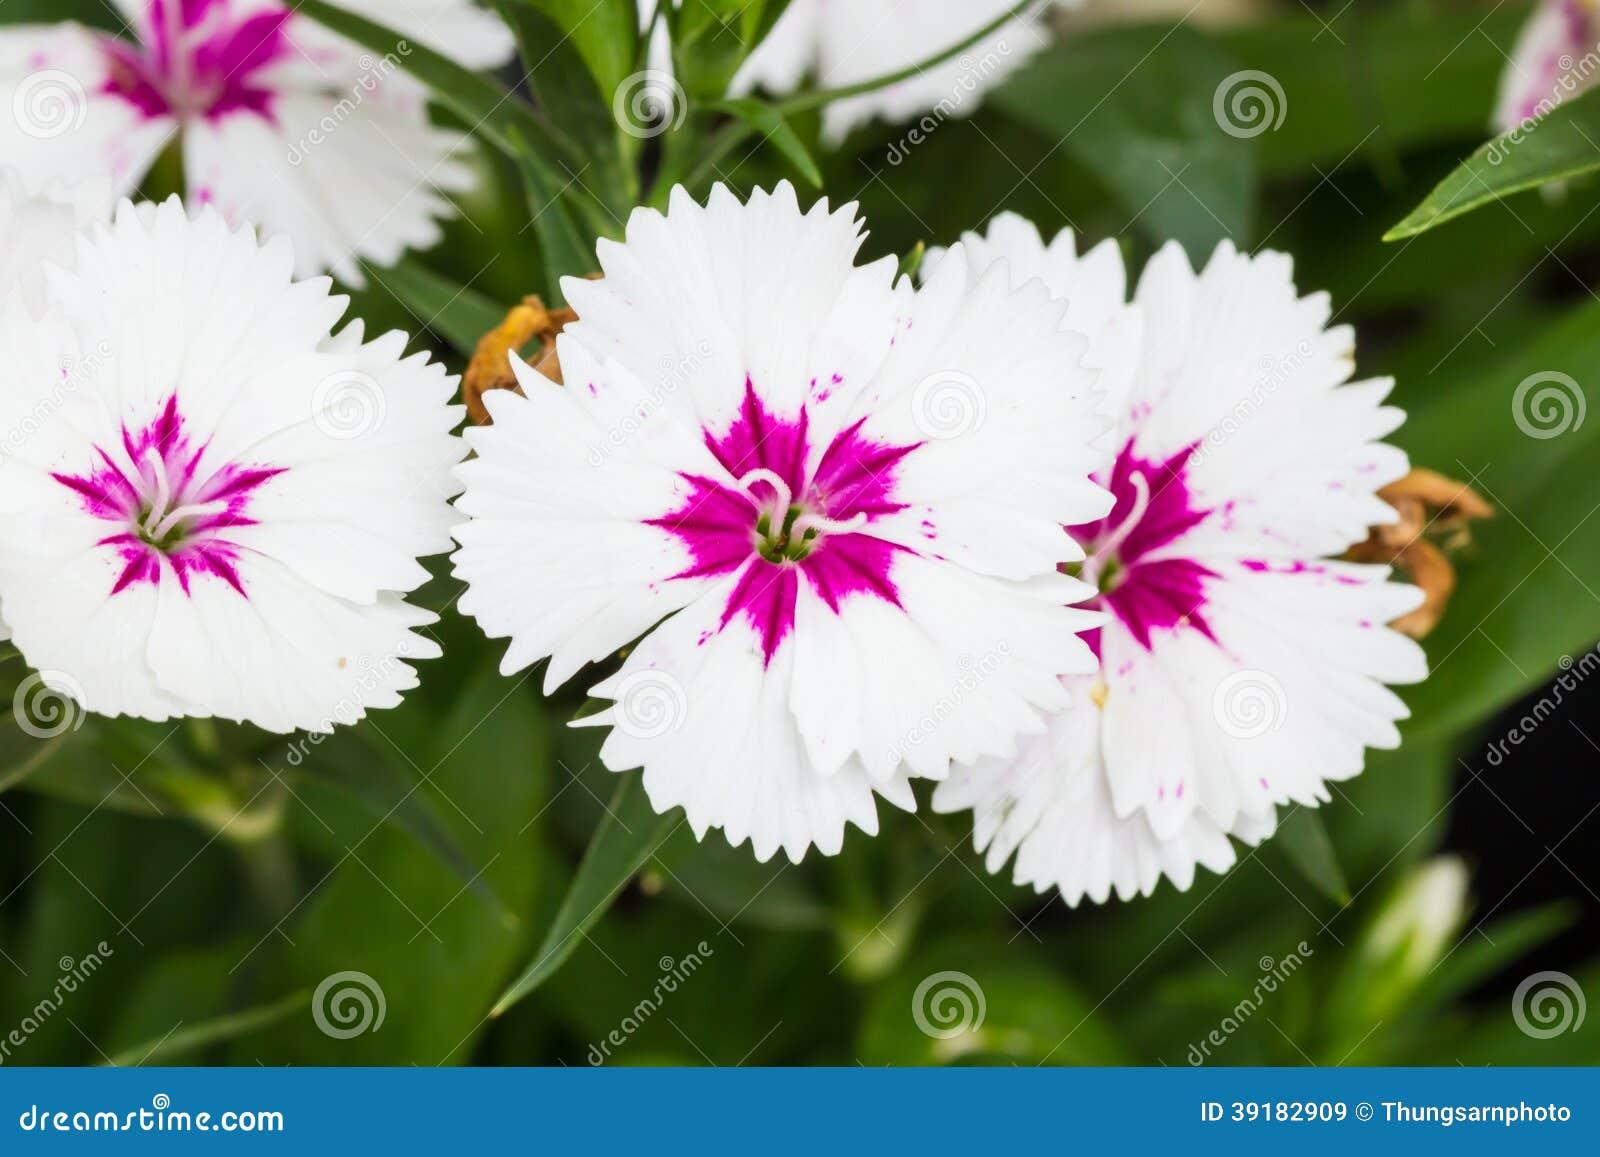 Indian Pink China Pink Flower Stock Image Image Of Interior